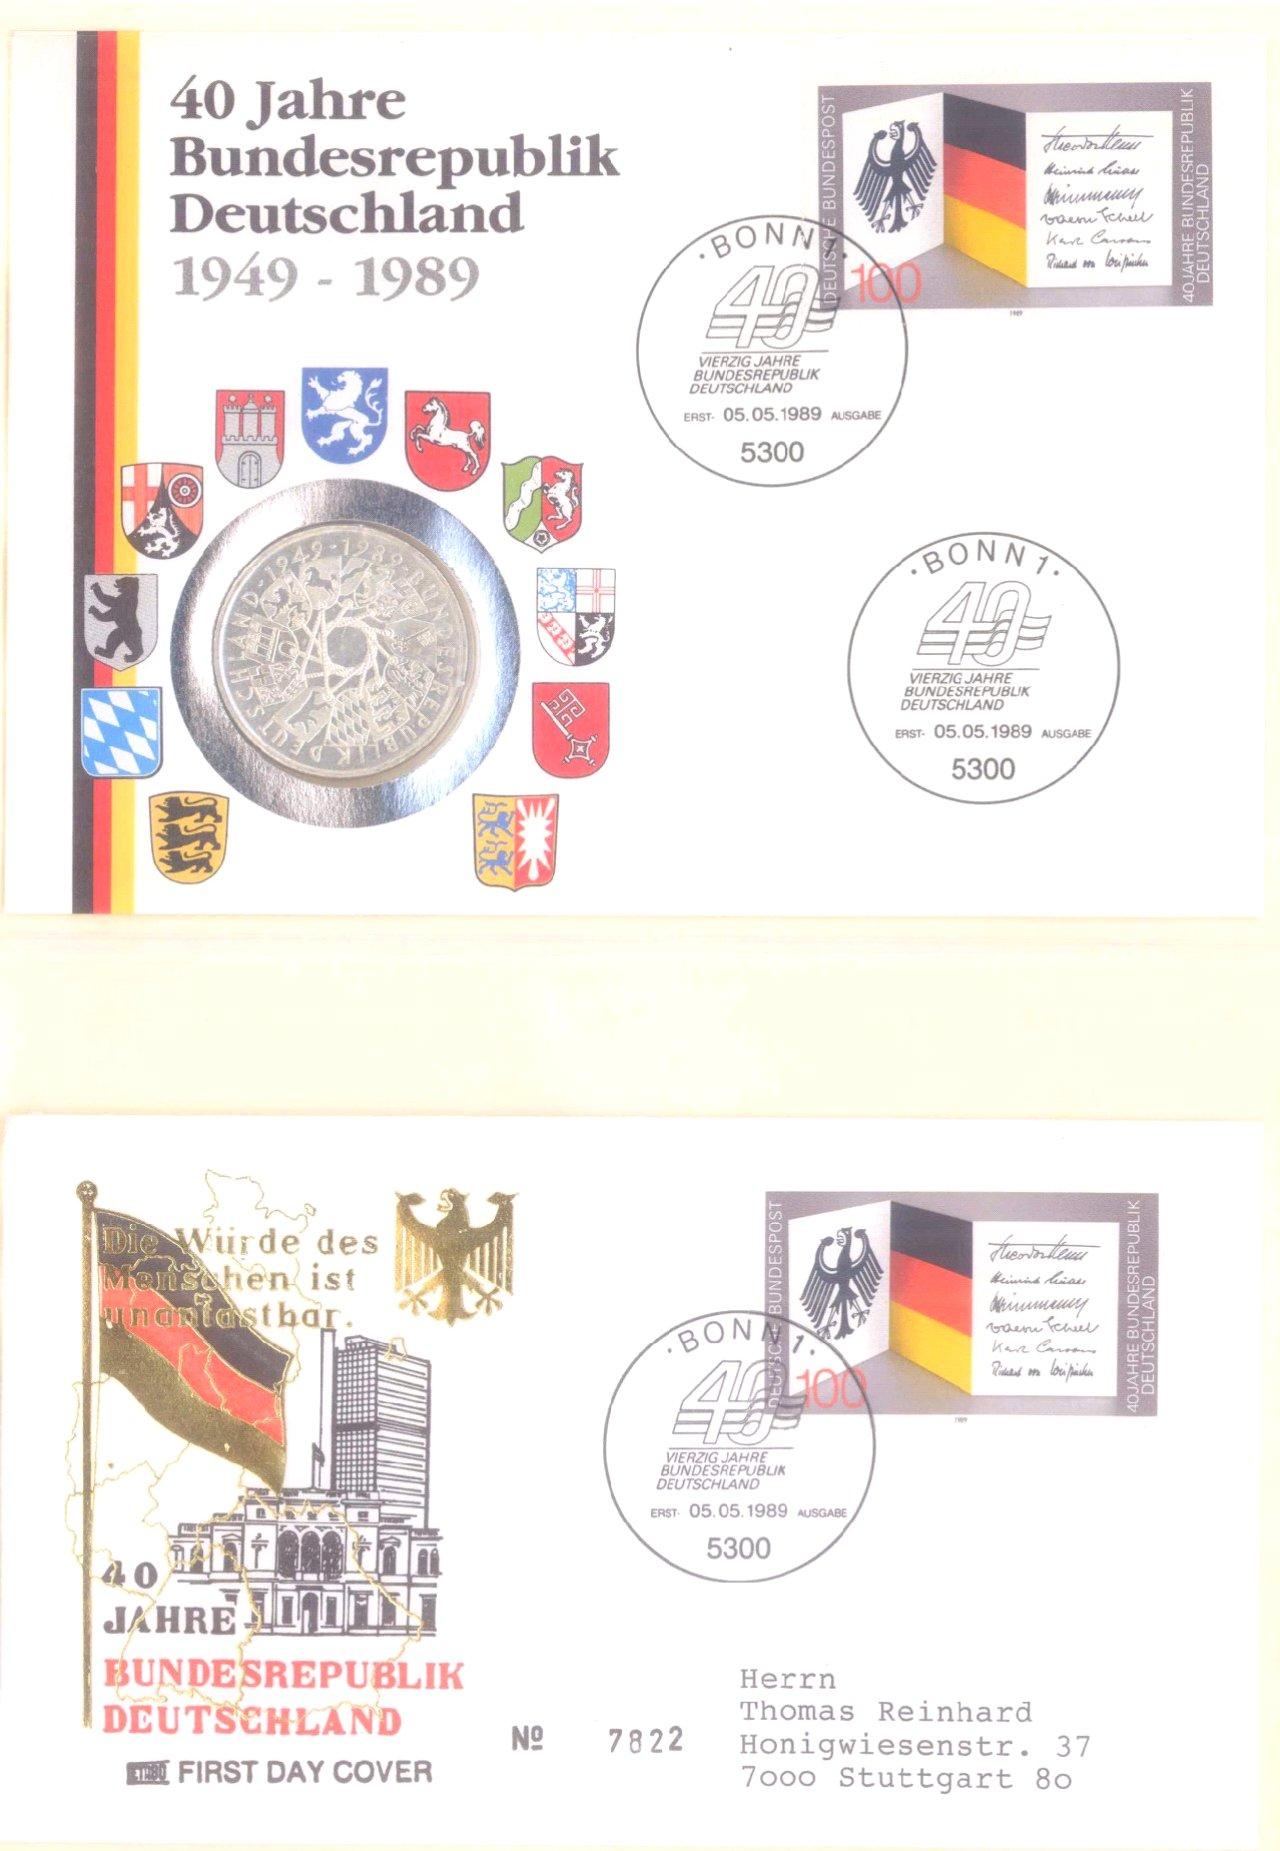 Sammlung Borek Numisbriefe im Ringbinder-11